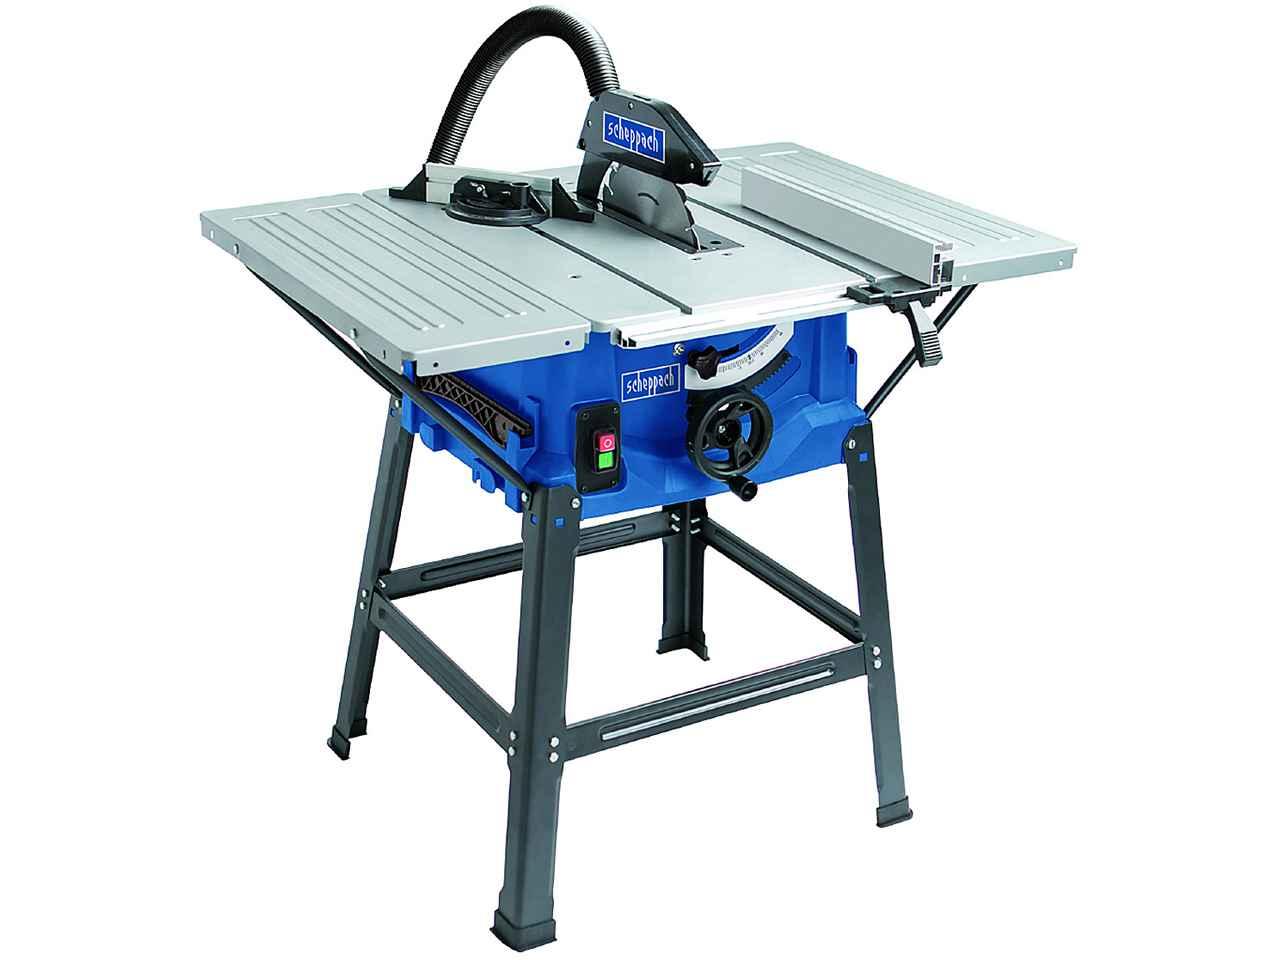 Scheppach Hs100s 230v 250mm 10 Table Saw Bench Ebay